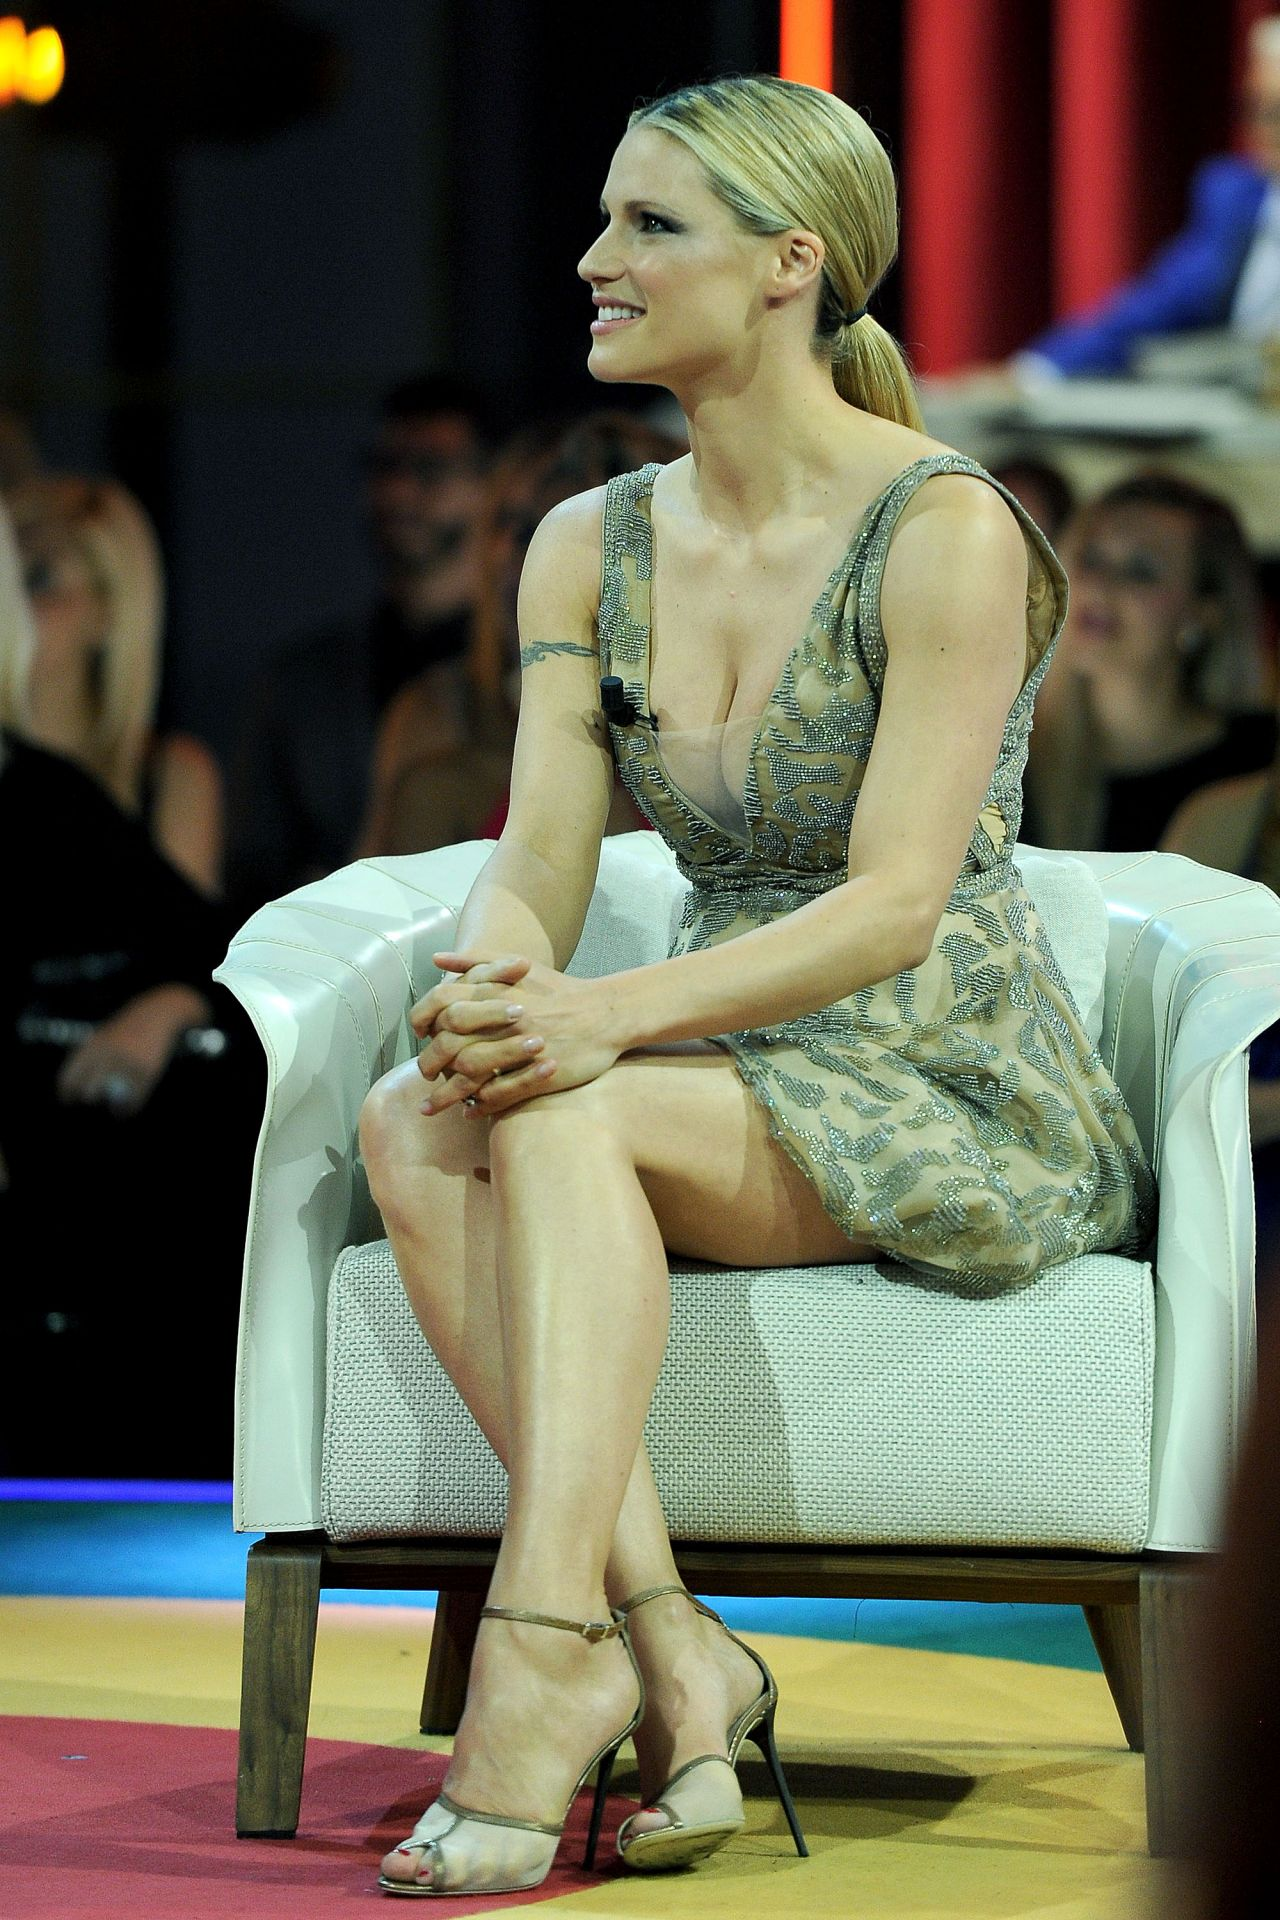 Michelle Hunziker Guest In Tv Show In Milan May 2015